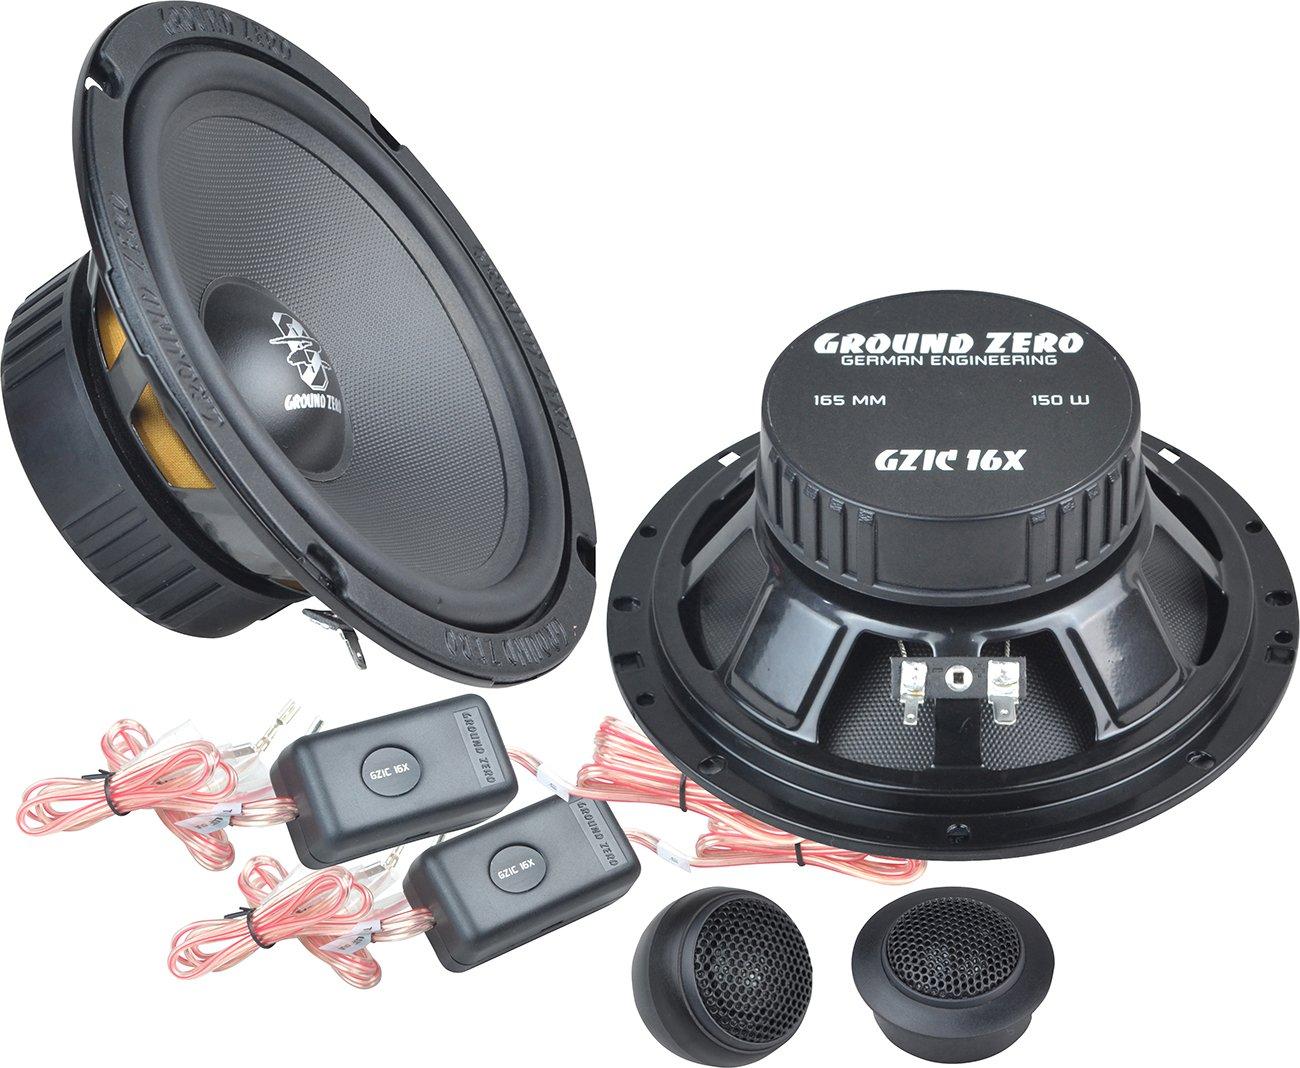 Ground Zero GZIC 16X - 16cm Lautsprecher System